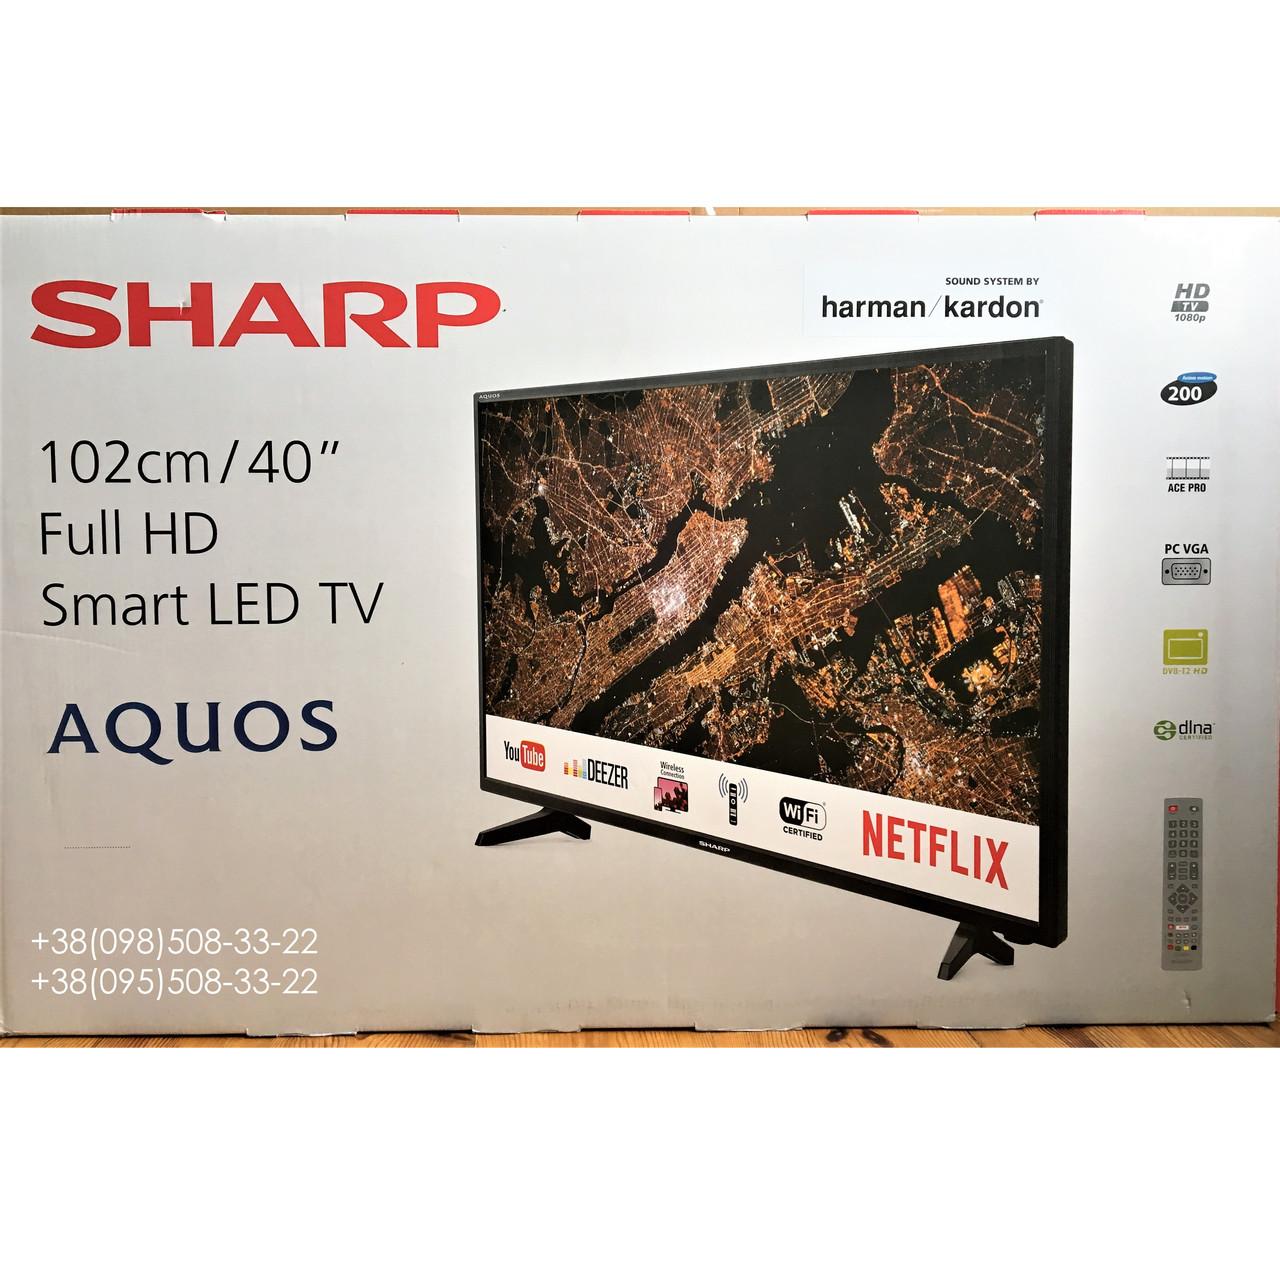 Телевизор Sharp LC-40FG5242E (Smart, Full HD, AM 200Гц, sound system by harman/kardon 2 x 10Вт, DVB-C/T2/S2)